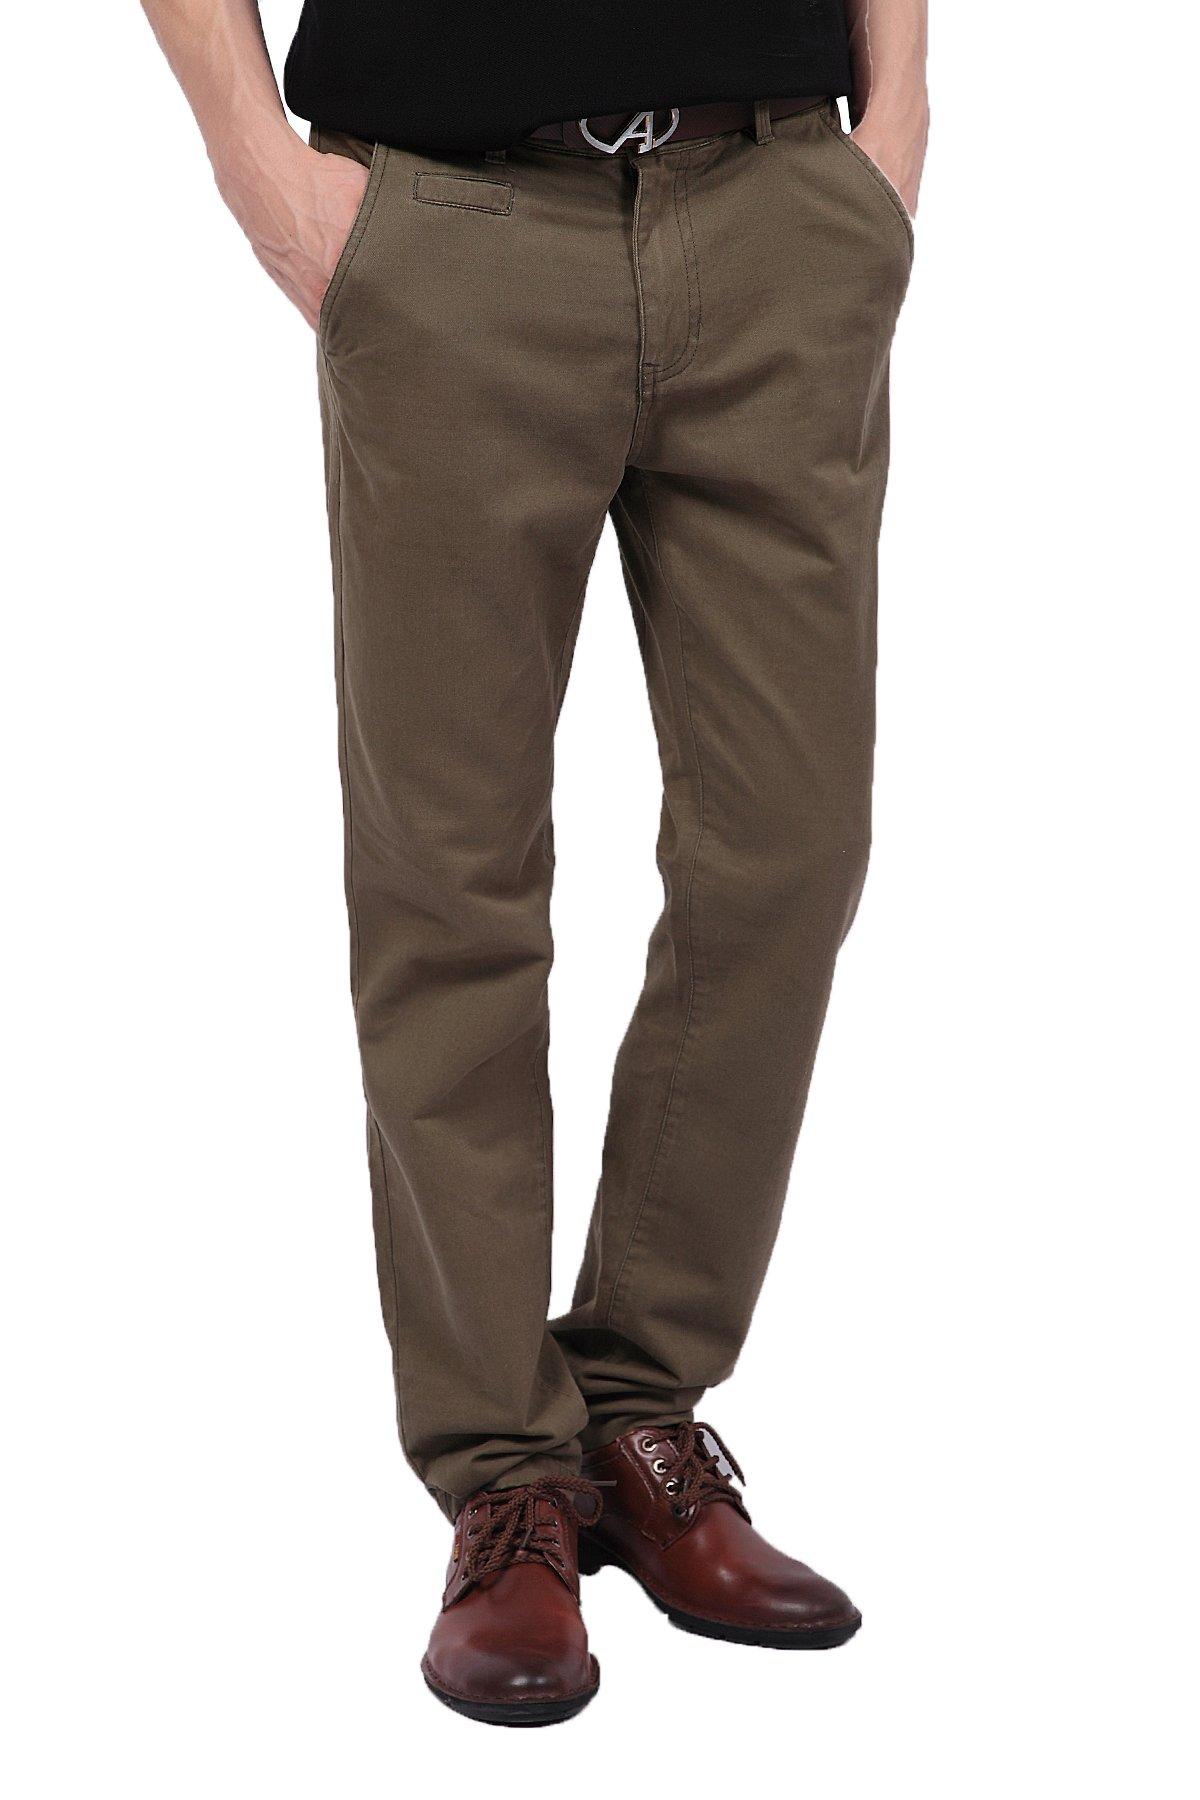 Pau1Hami1ton PH-03 Men's Chino Pants Flat-Front Casual Kaki Twill Slim-Fit Straight Leg(29, Green)